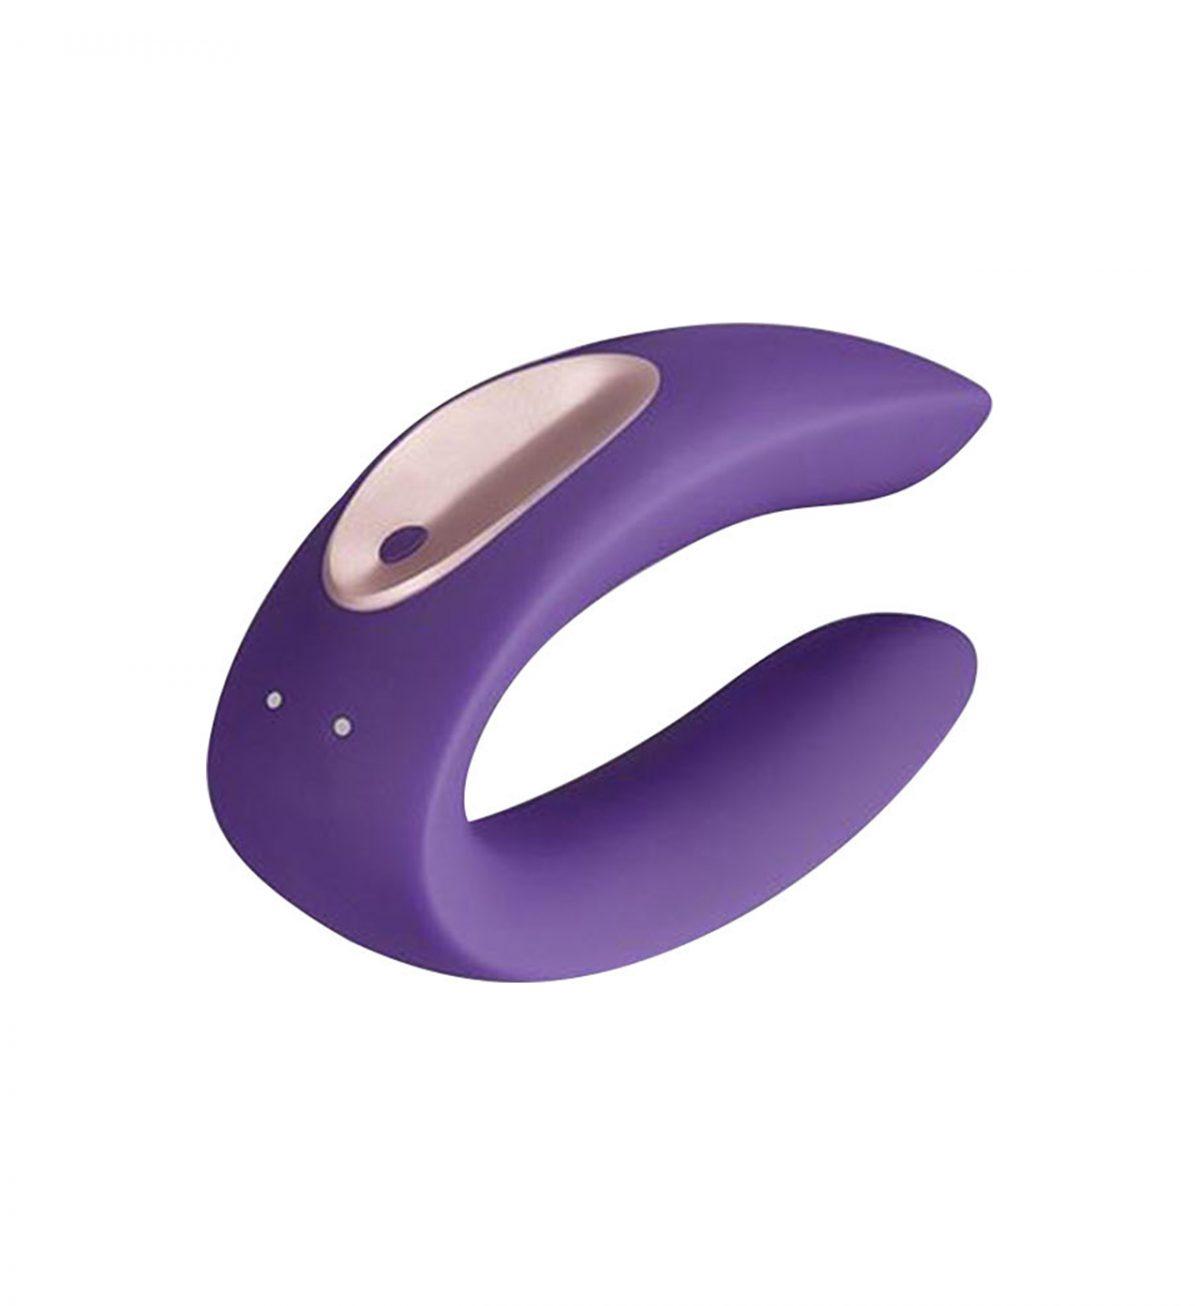 Partner Plus - Vibrator for både klitoris og G-punkt - Satisfyer